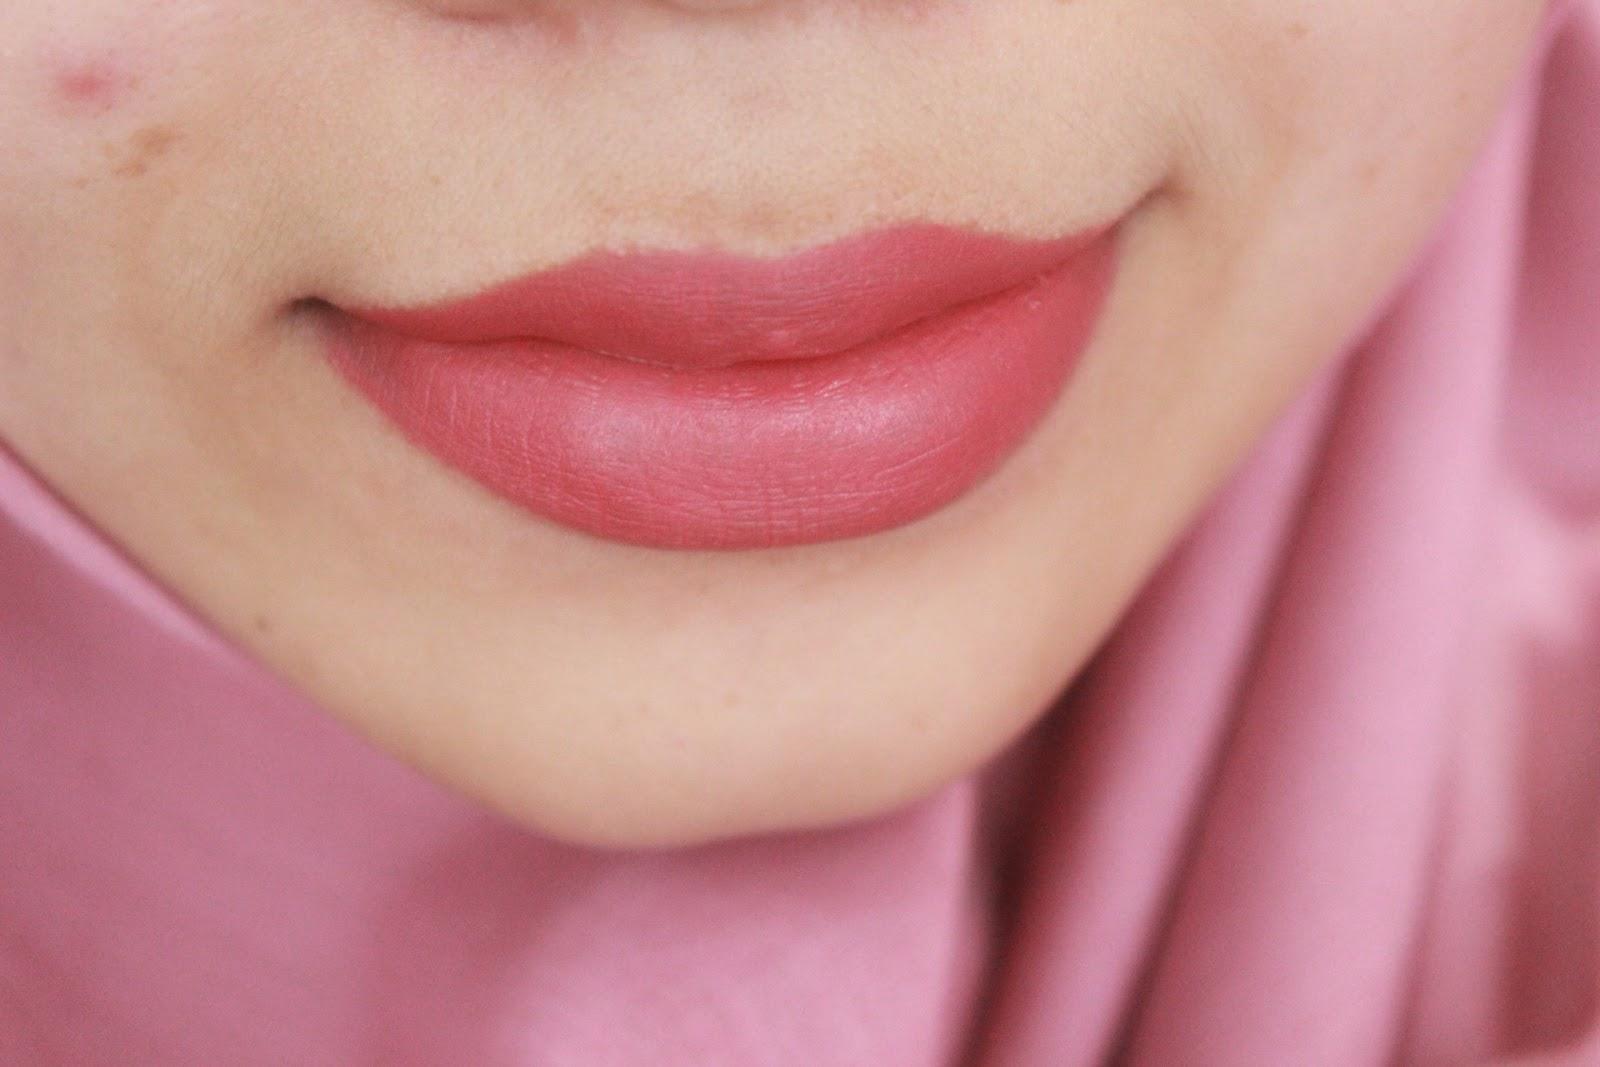 Wardah Long Lasting Lipstick 01 02 03 06 12 Rahmaediary